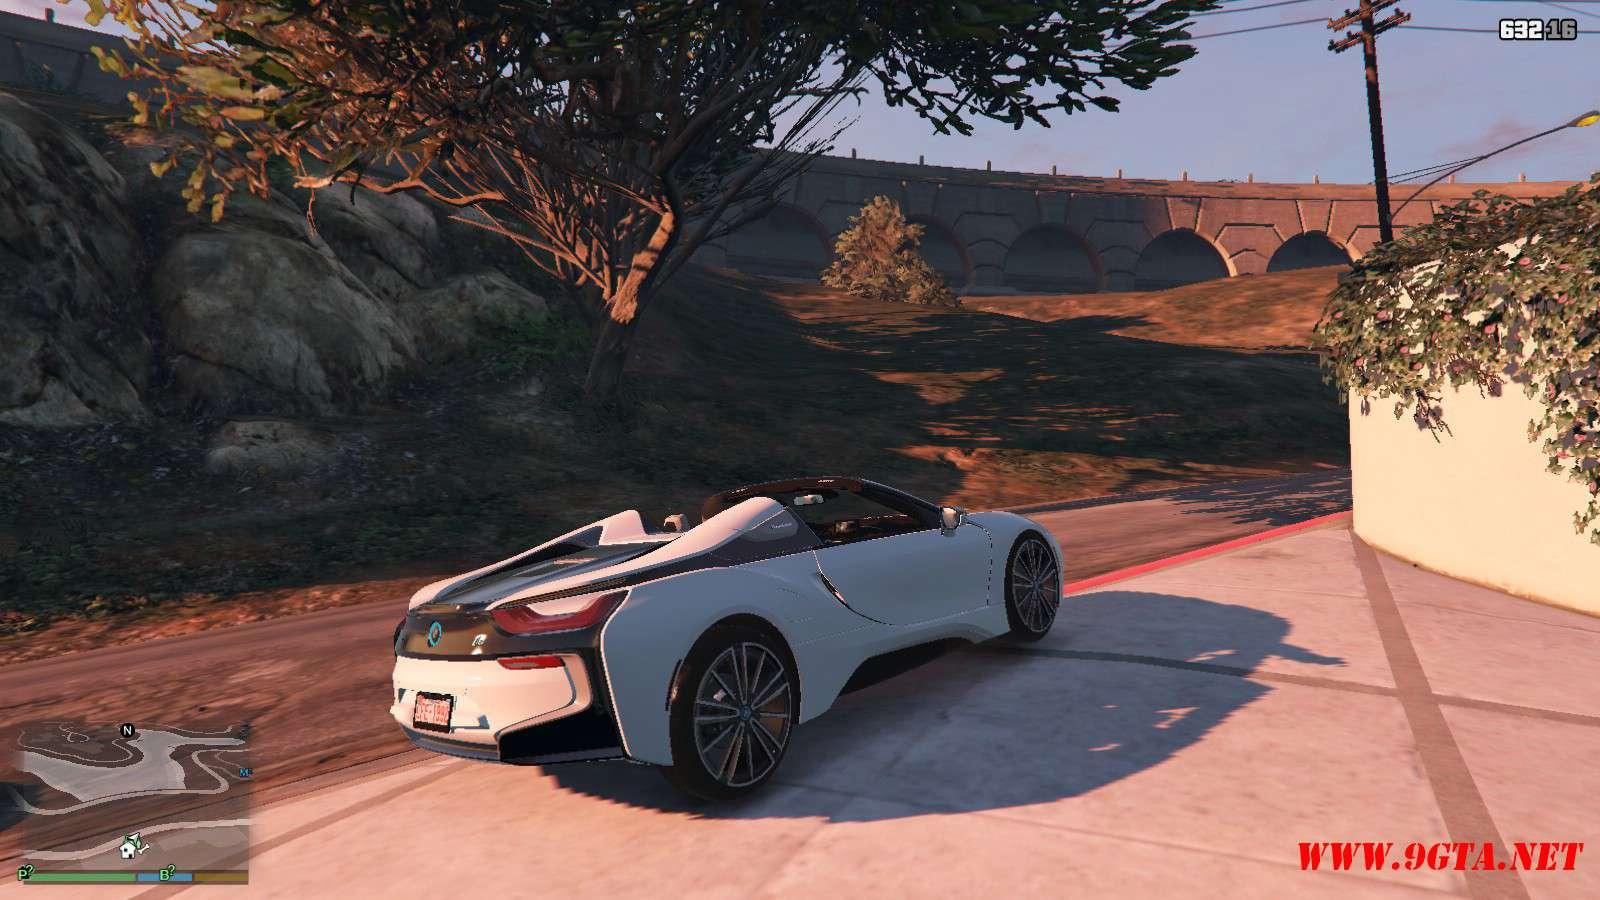 2019 BMW I8 Roadster GTA5 Mods (4)